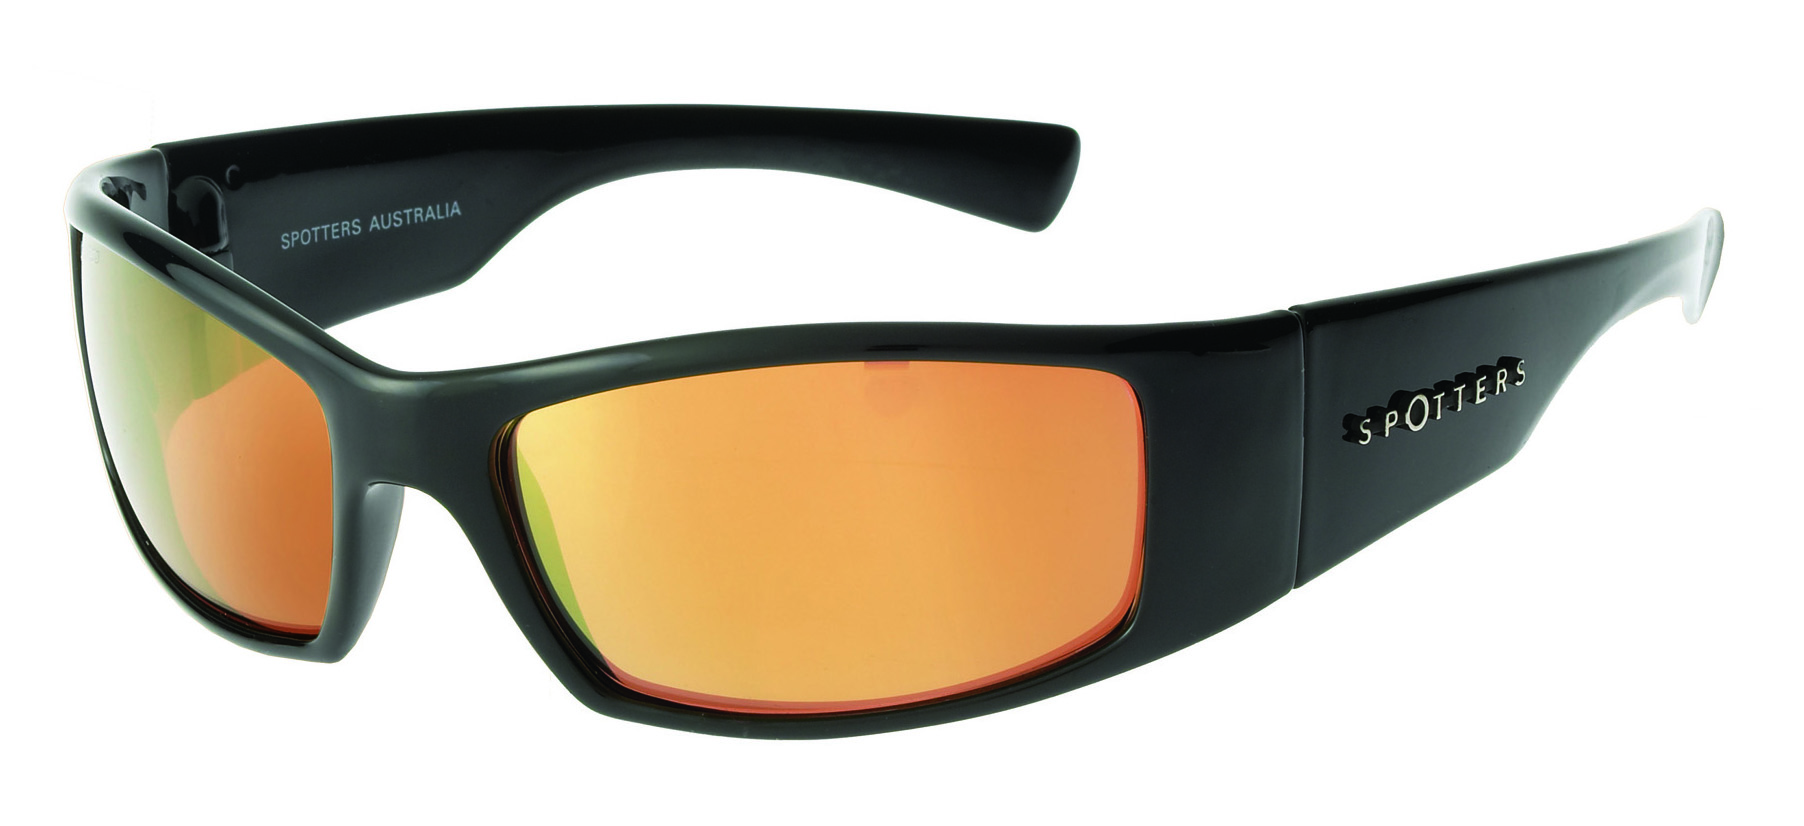 spotters sunglasses 8.jpg